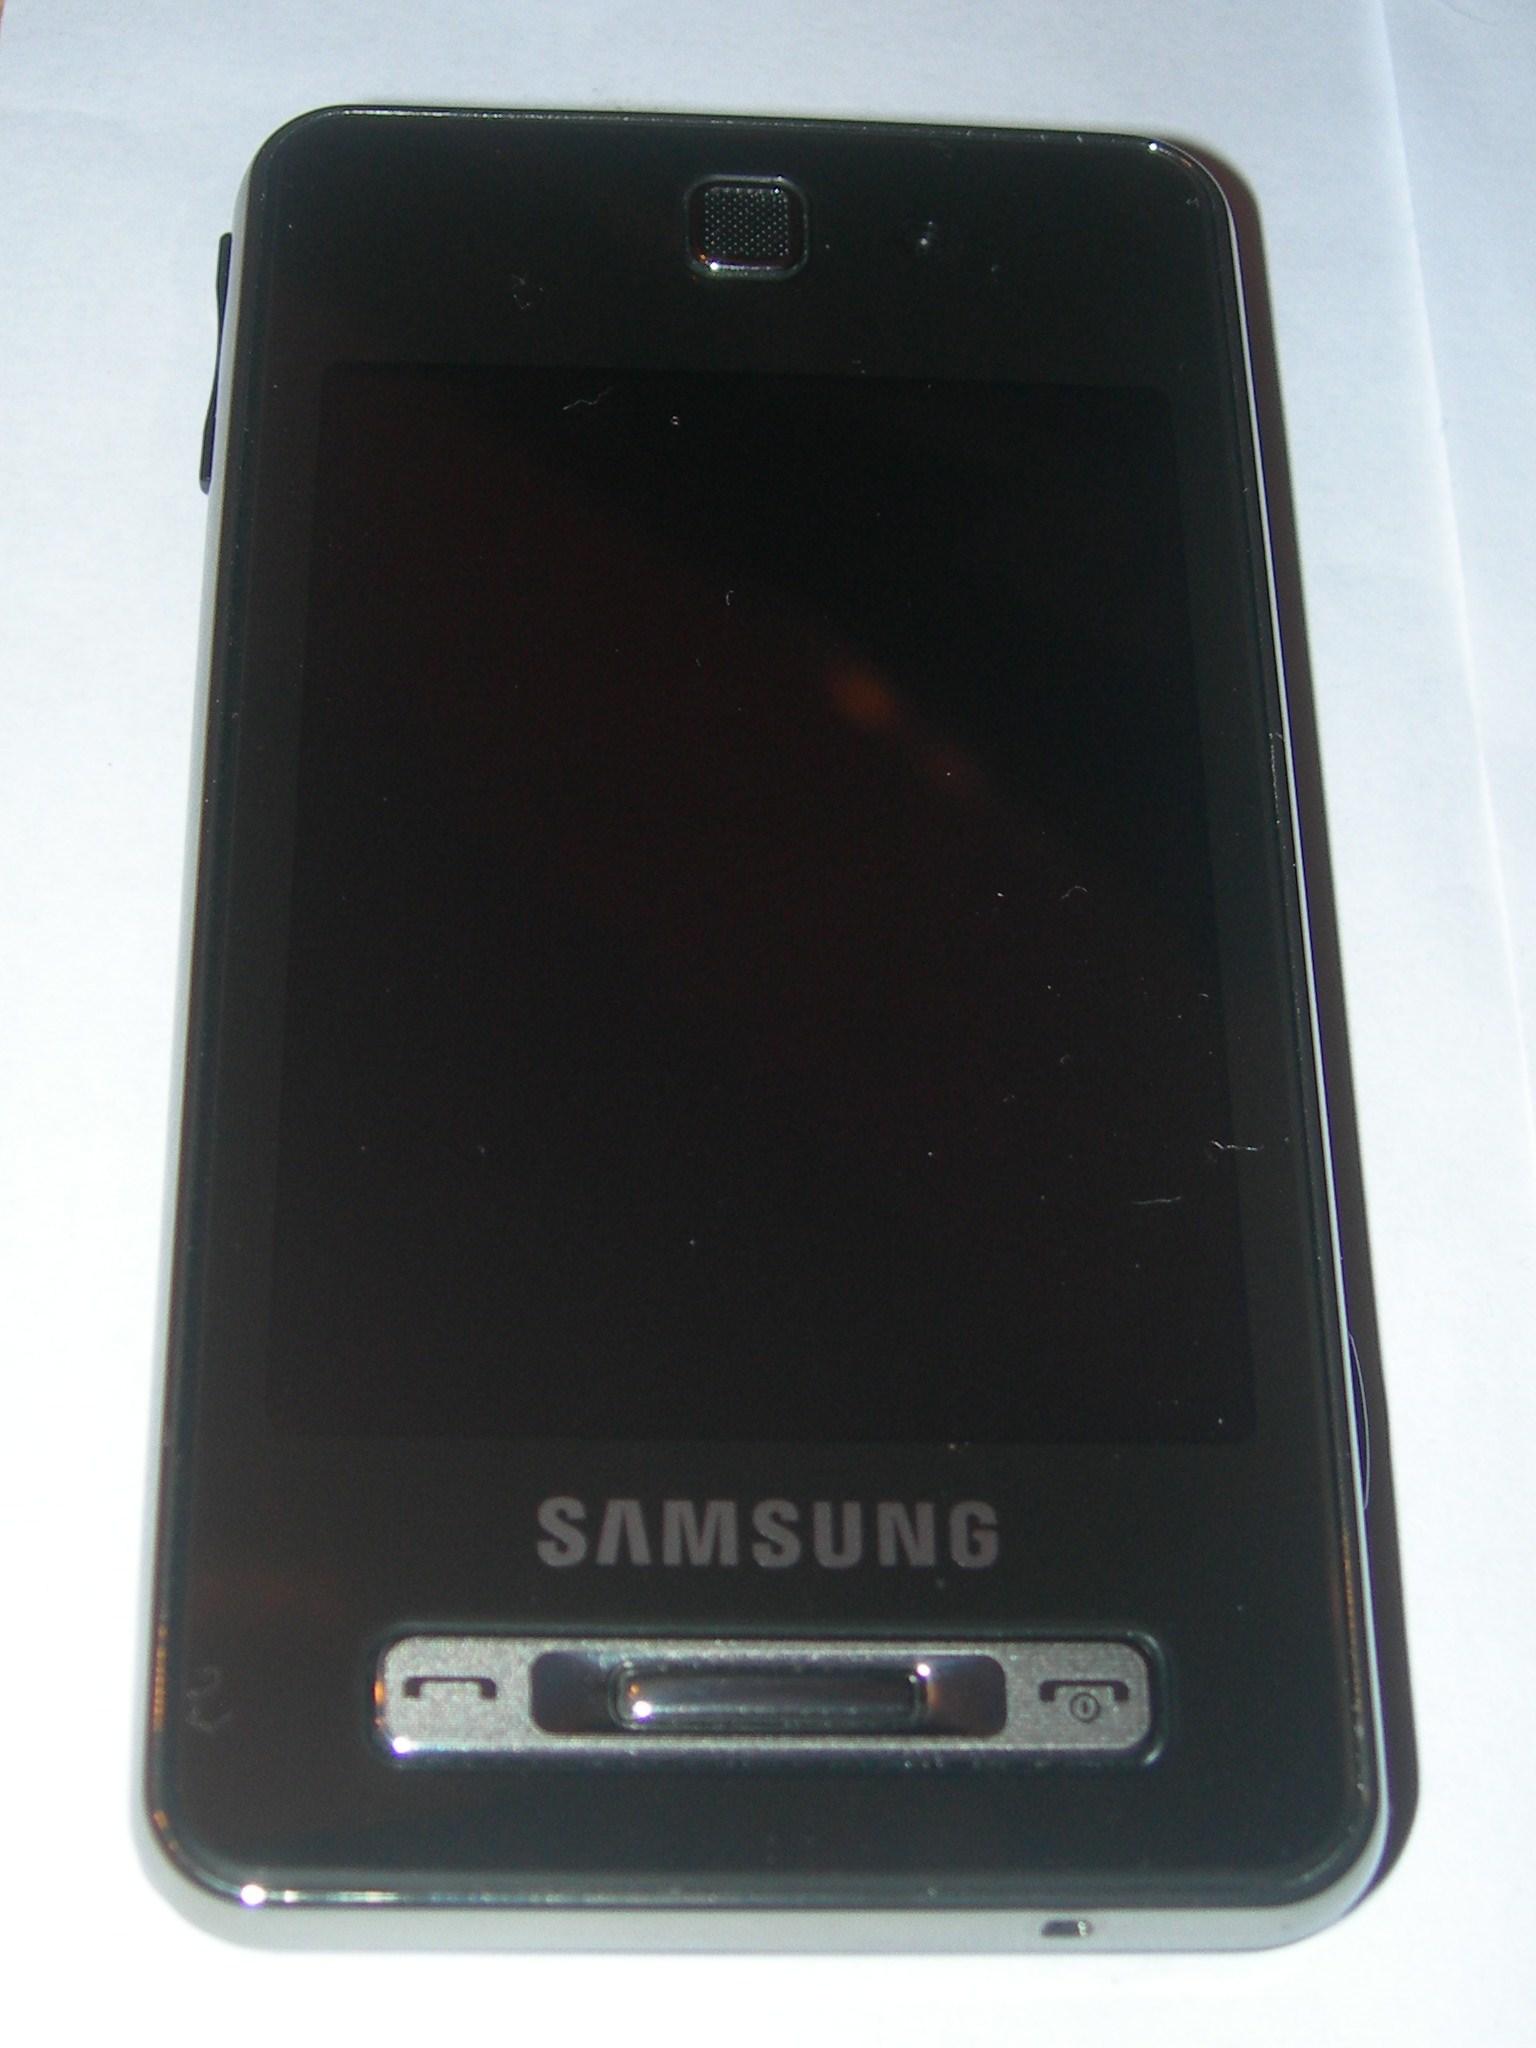 Samsung b360e java whatsapp download